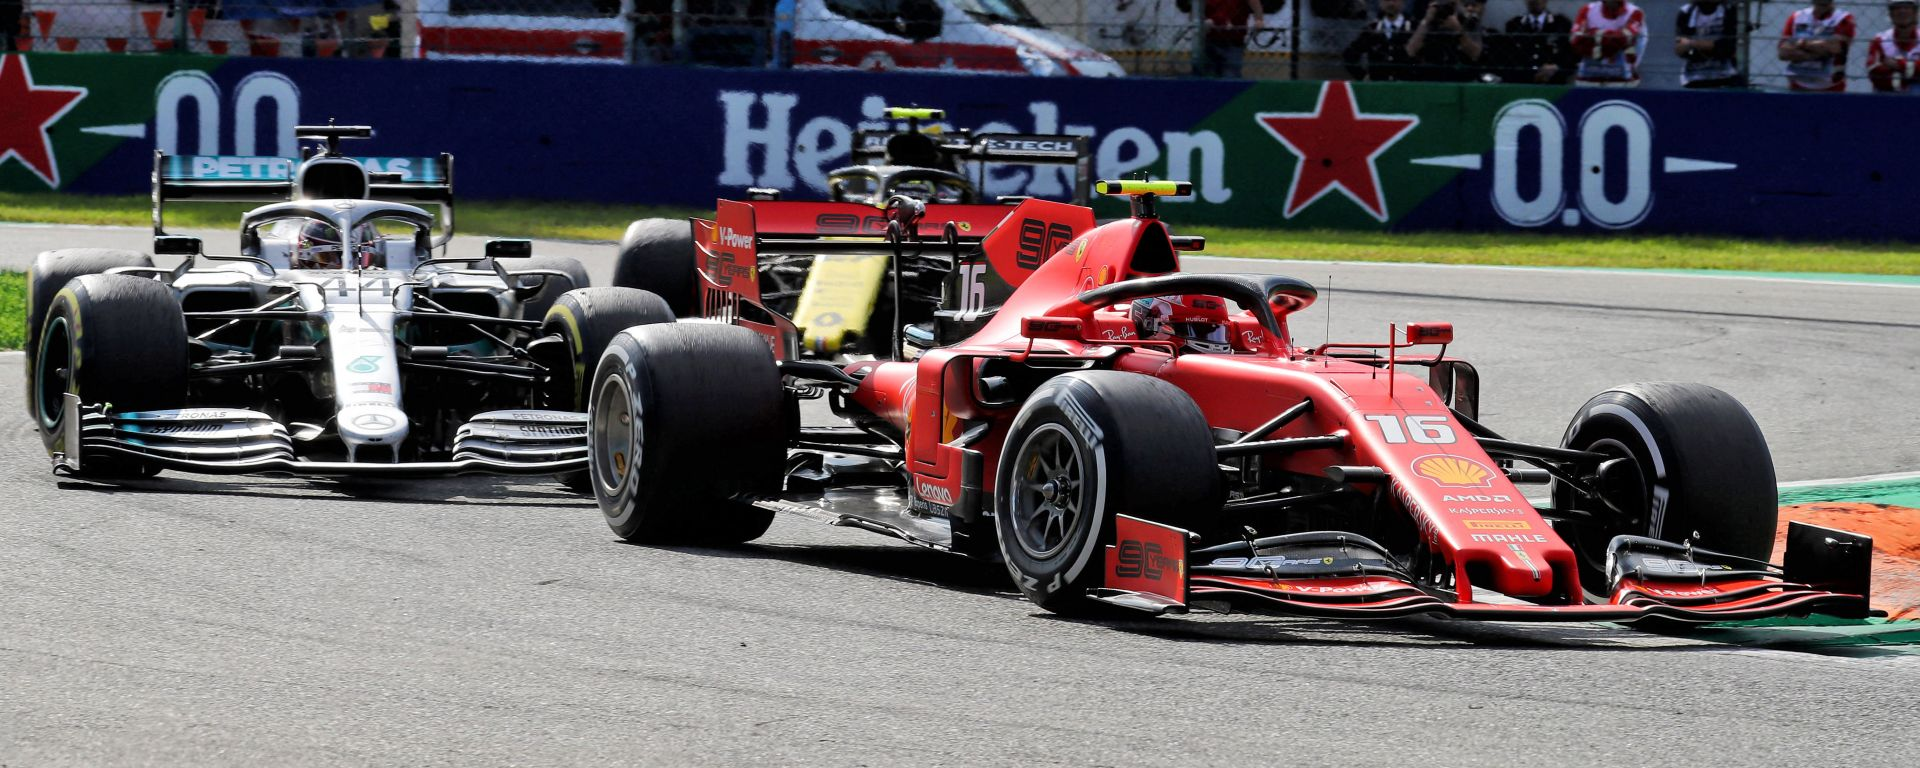 F1, GP Italia 2019: Charles Leclerc (Ferrari) e Lewis Hamilton (Mercedes)